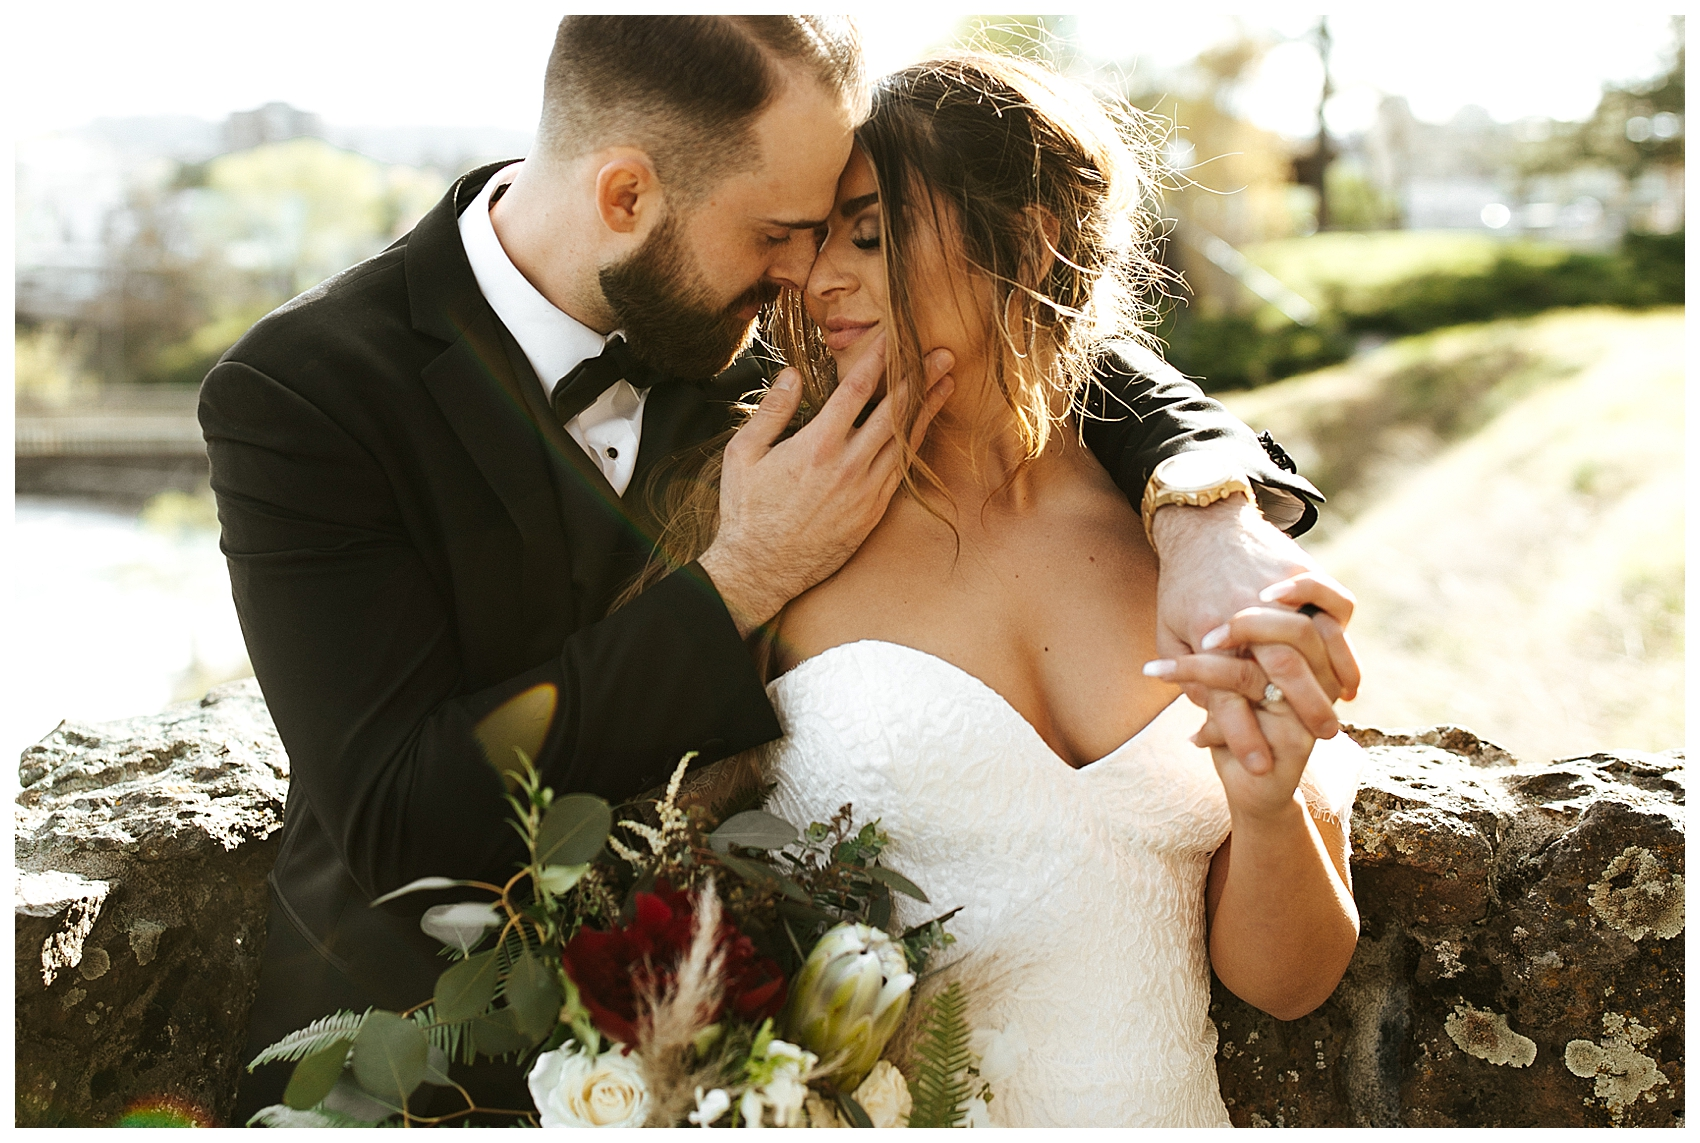 Chateau Rive Spokane Wedding Cassie Trottier Photography01093.jpg